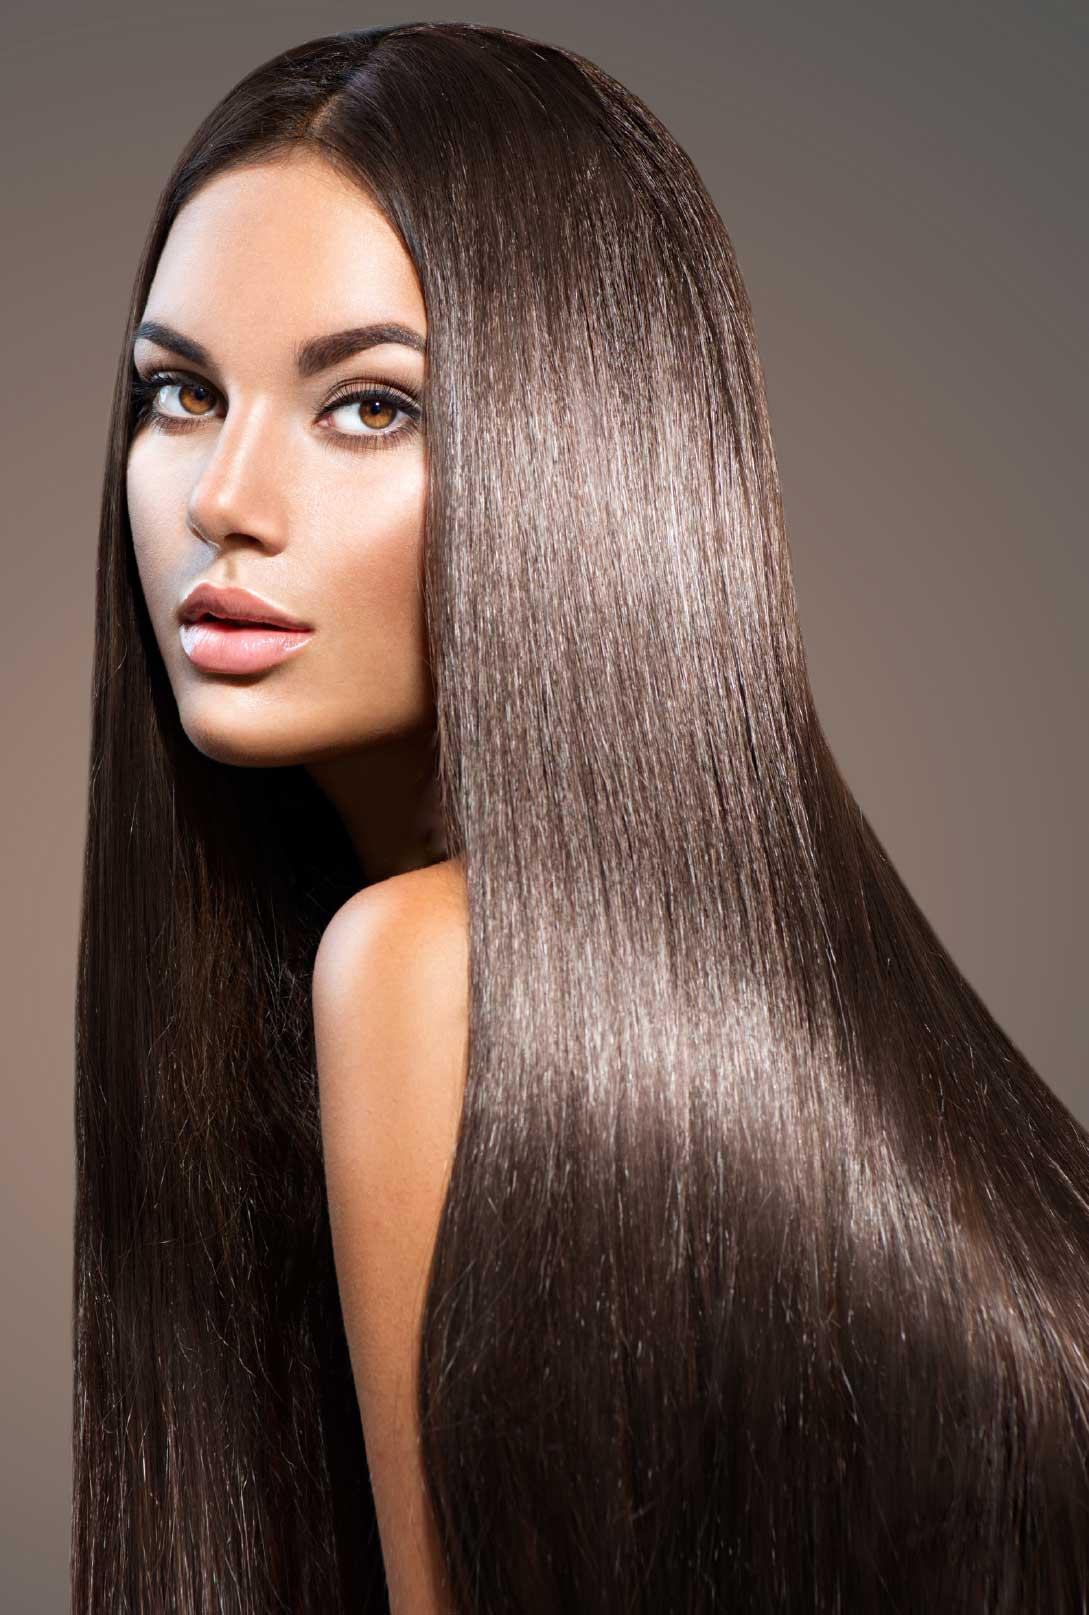 smeđa kosa nakon tretmana kosta hair proizvodima